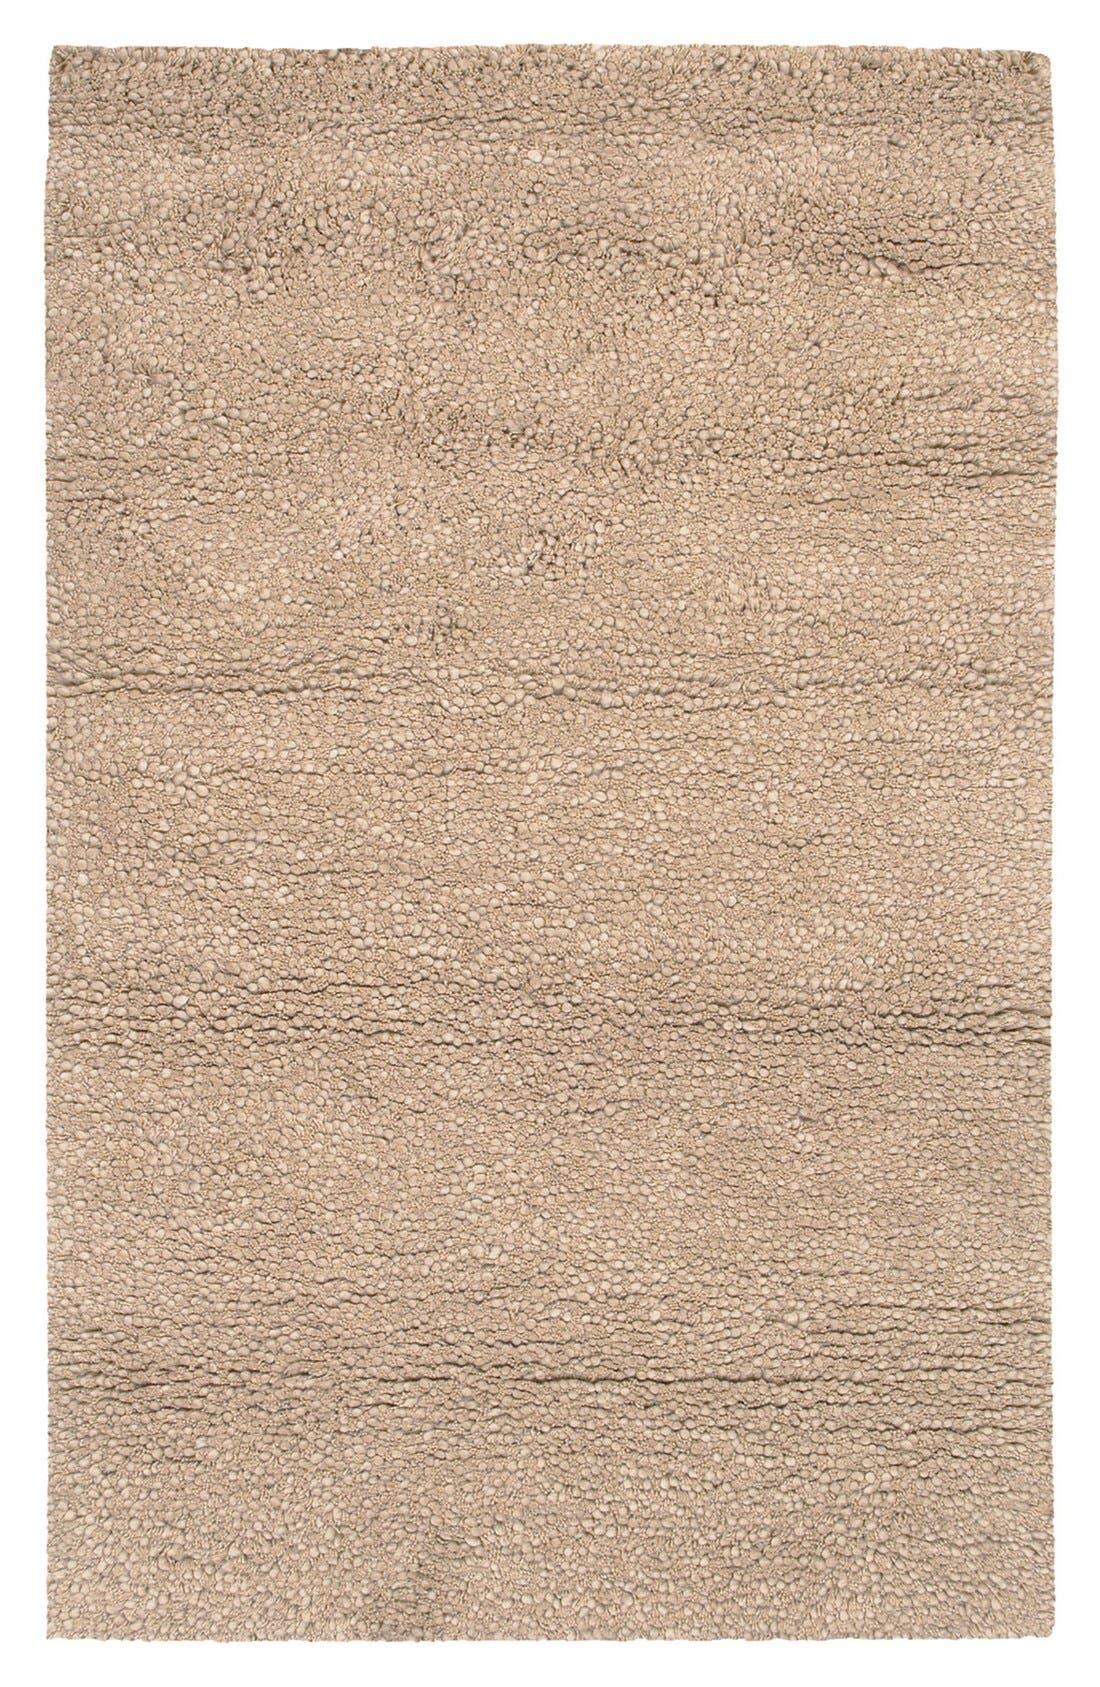 Main Image - Surya Home 'Metropolitan' Wool Rug